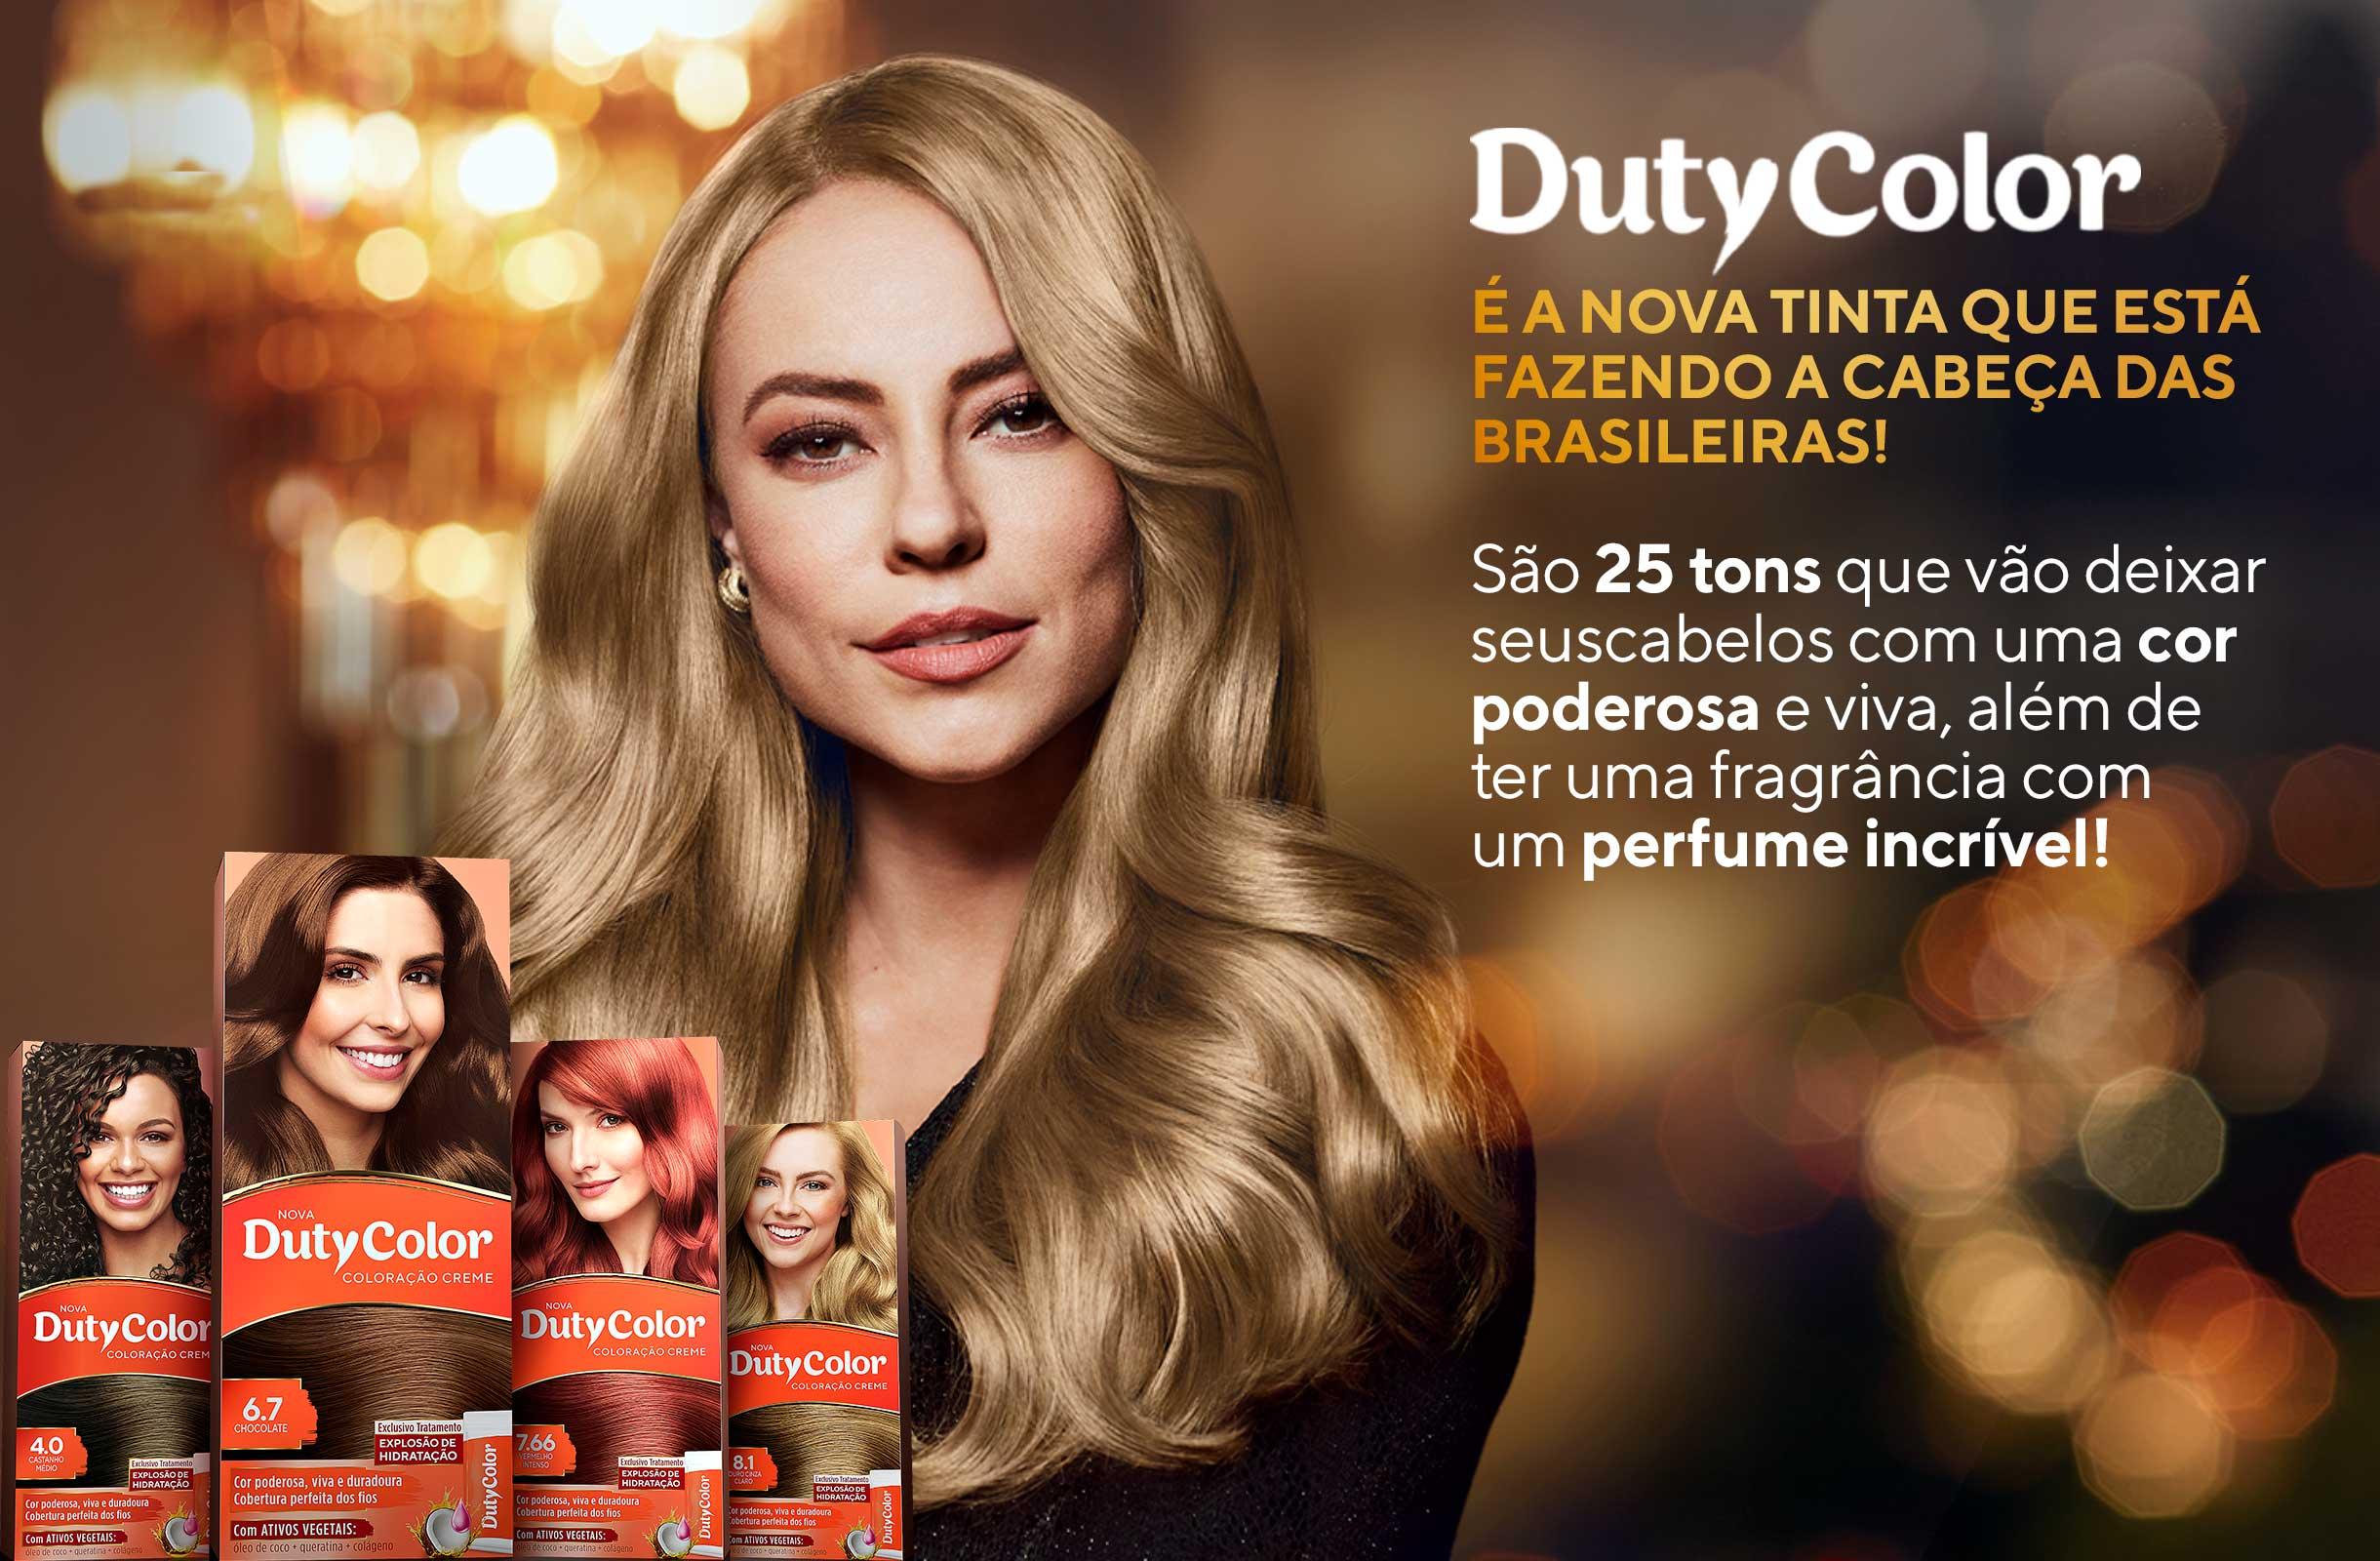 DutyColor: marca